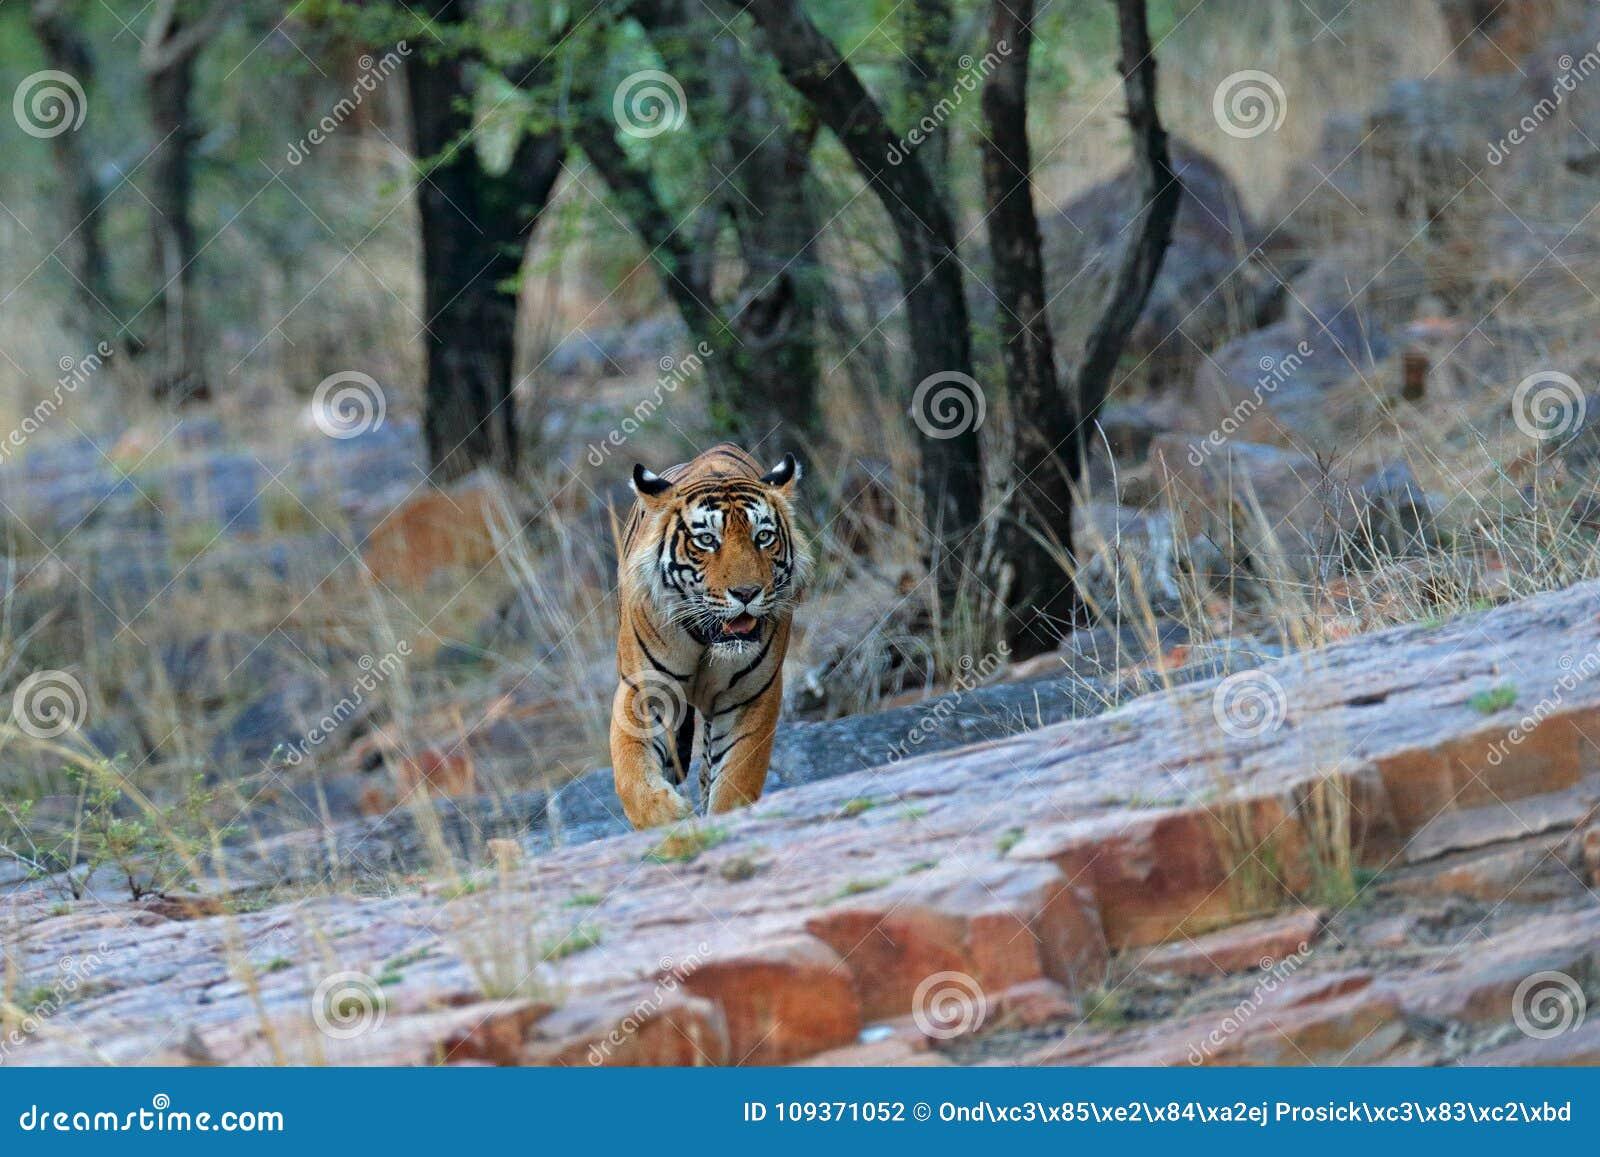 Indian tiger, wild danger animal in nature habitat, Ranthambore, India. Big cat, endangered mammal, nice fur coat. End of dry seas